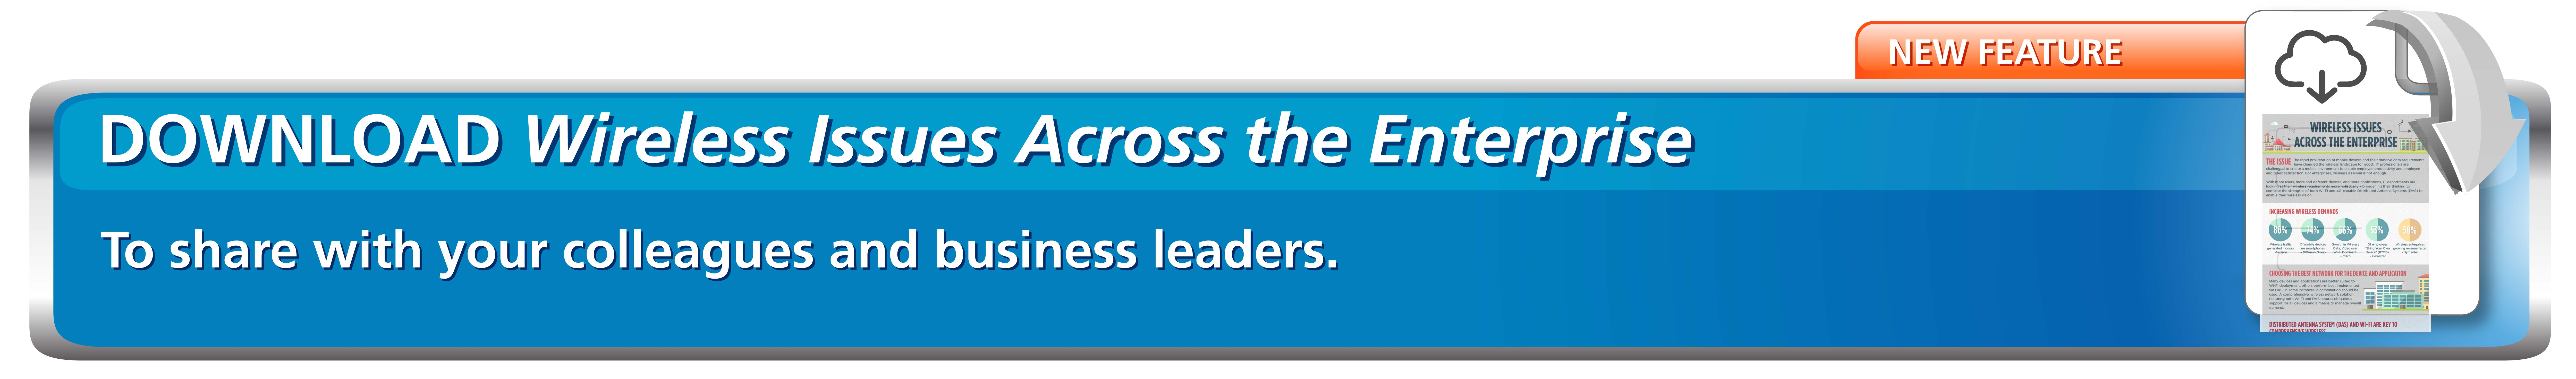 WWI Enterprise Infog -CTA banner-01